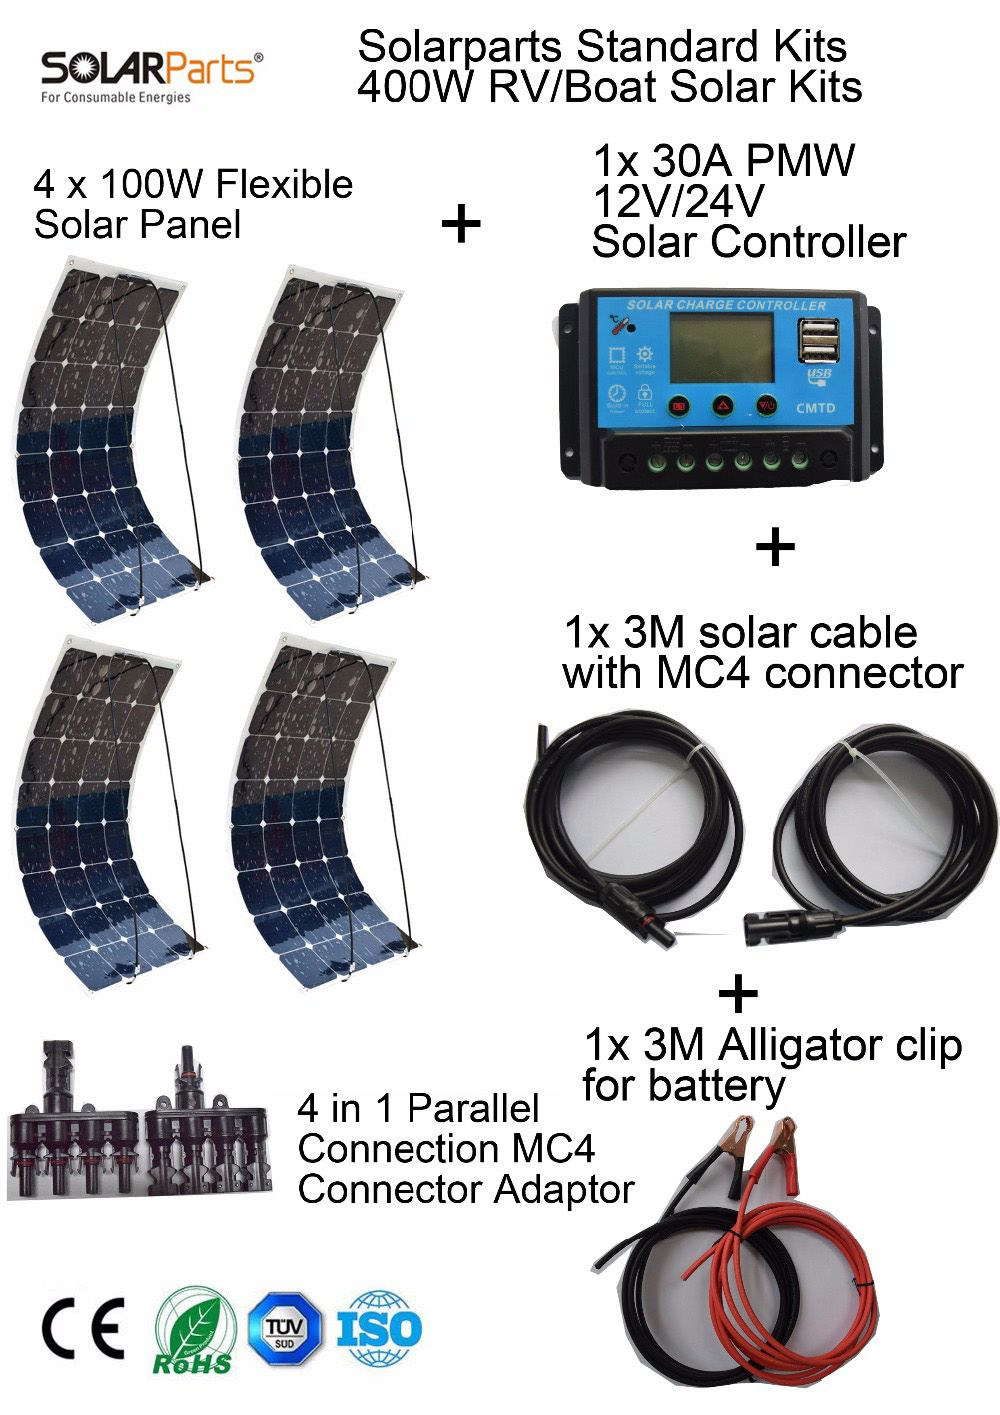 Solarparts Standard Kits 400 Watt DIY RV/Boot Kits Solar System 100 Watt flexible solar panel + controller + außen licht led-modul.